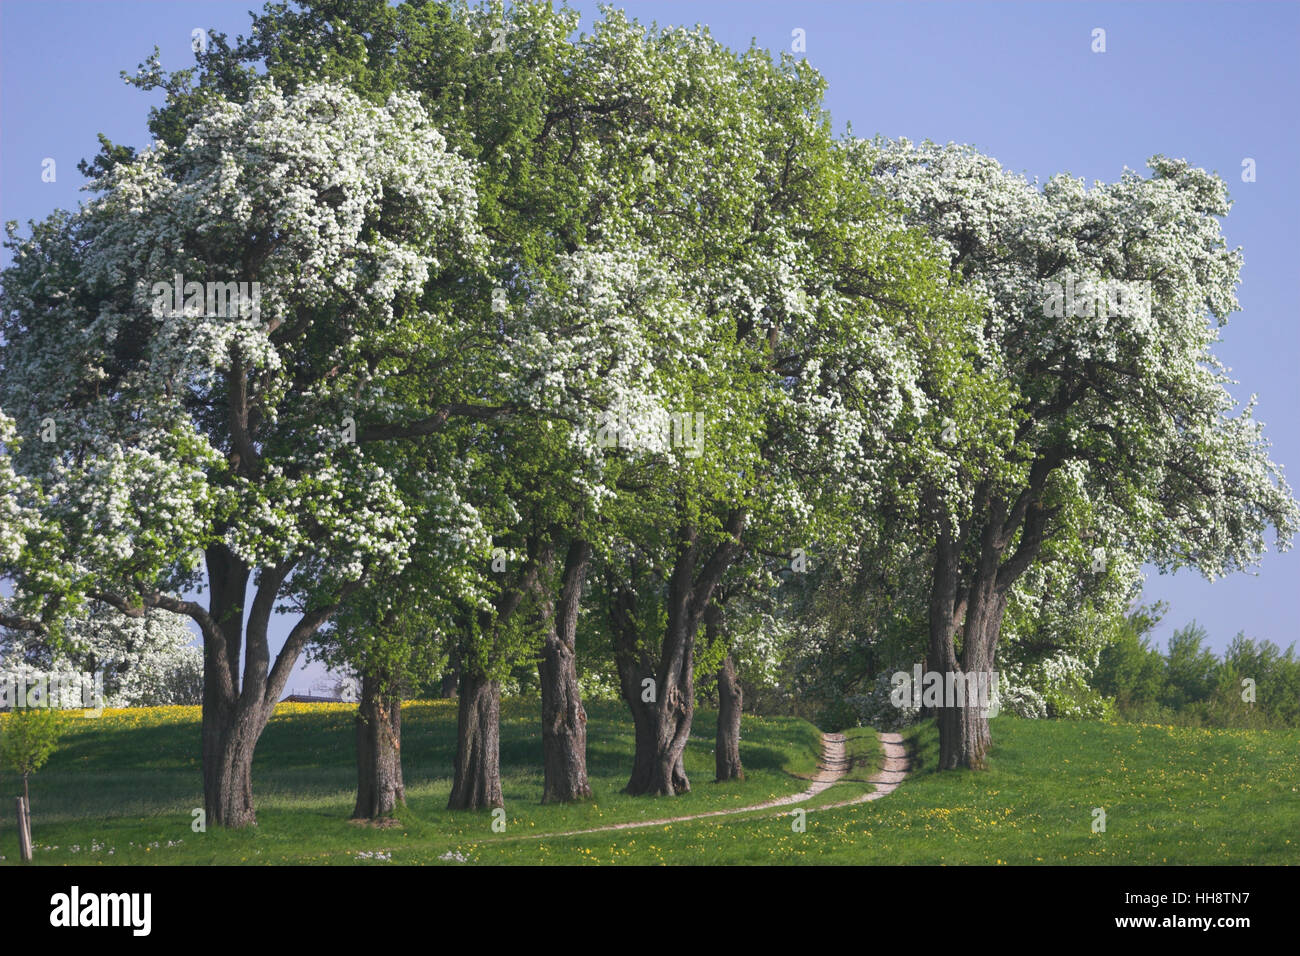 Blossoming Pear Trees Mostviertel Region Lower Austria Austria